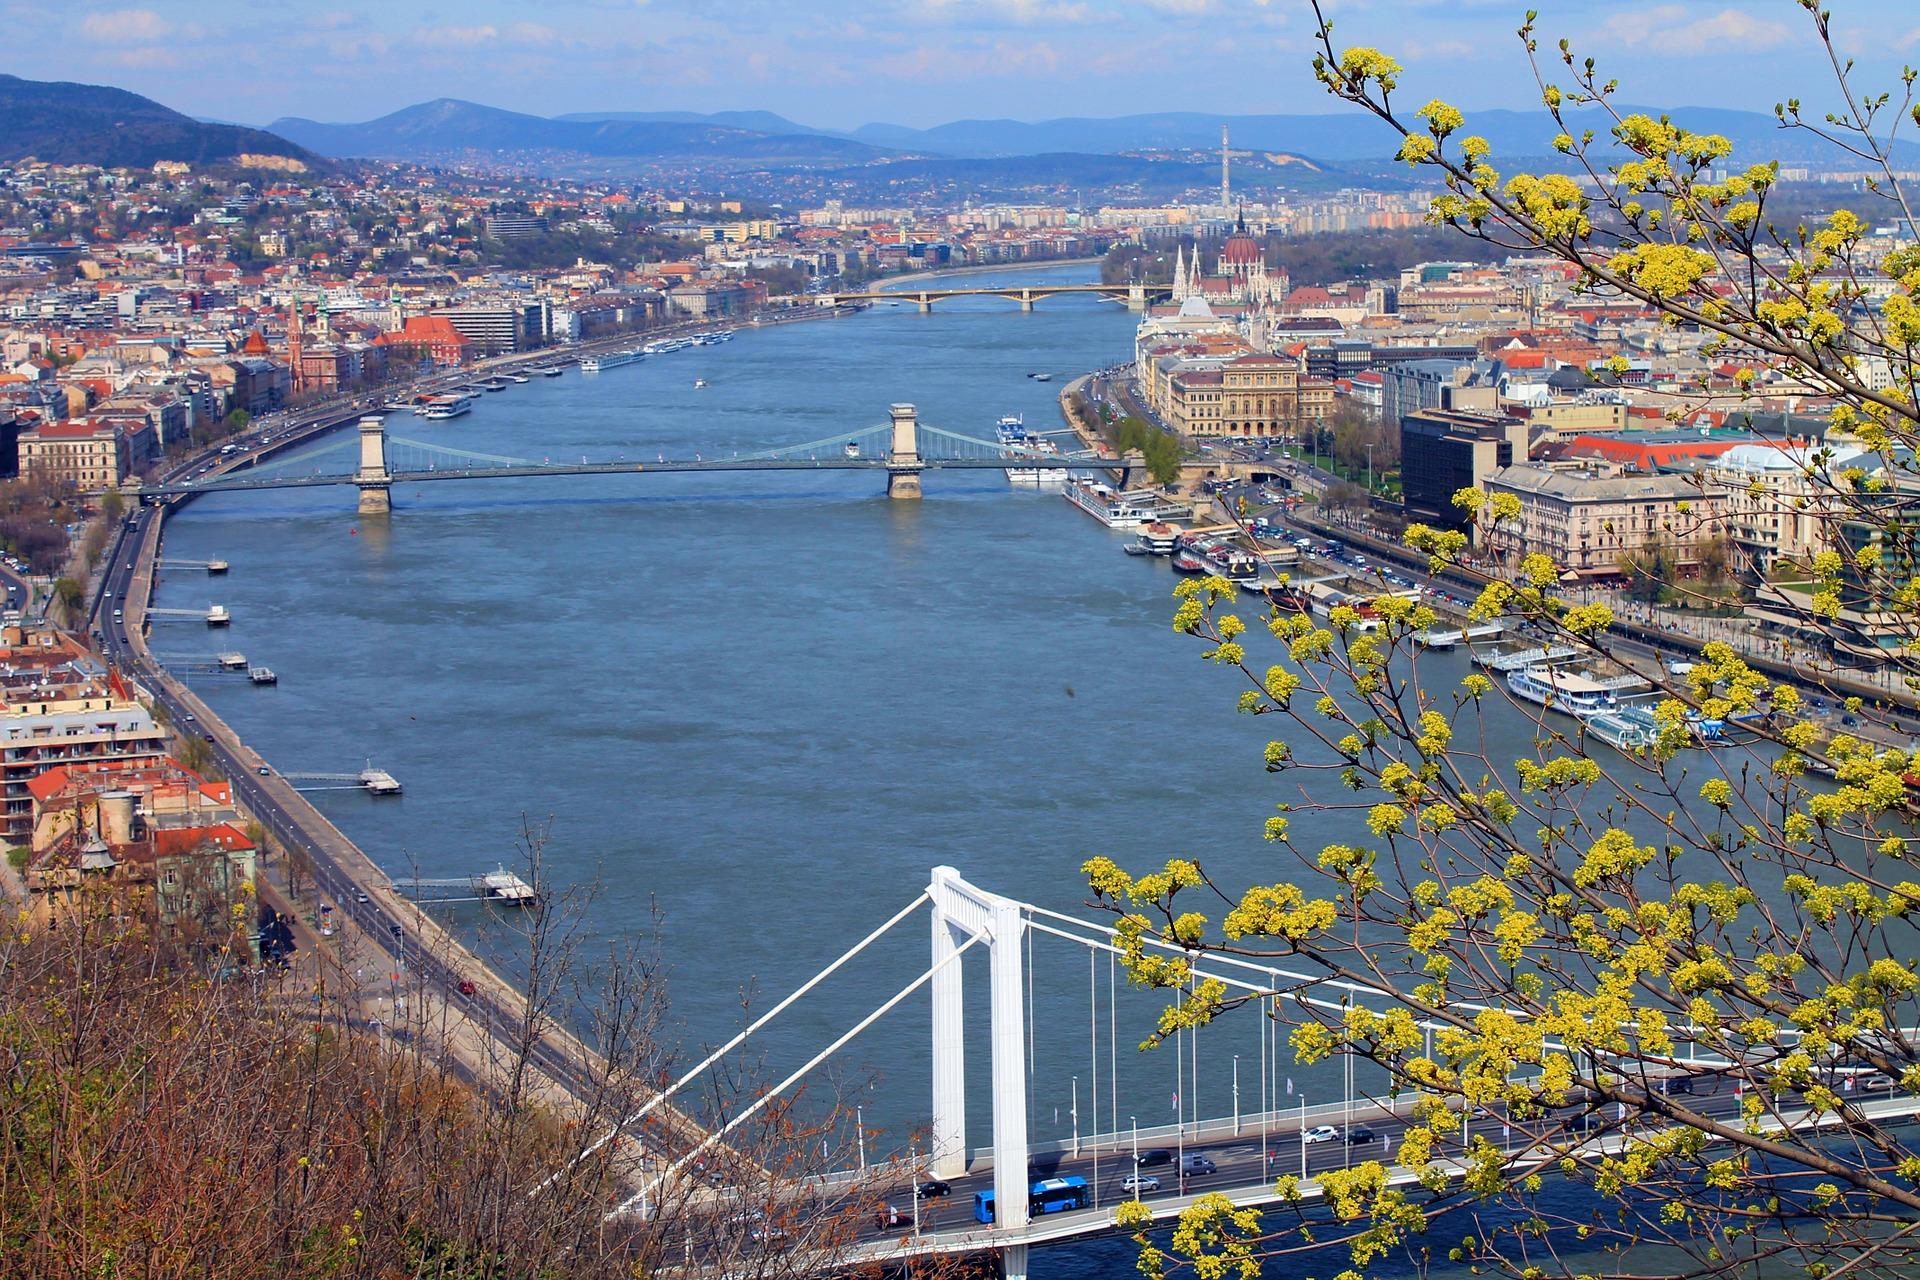 Danube River in Budapest, Hungary